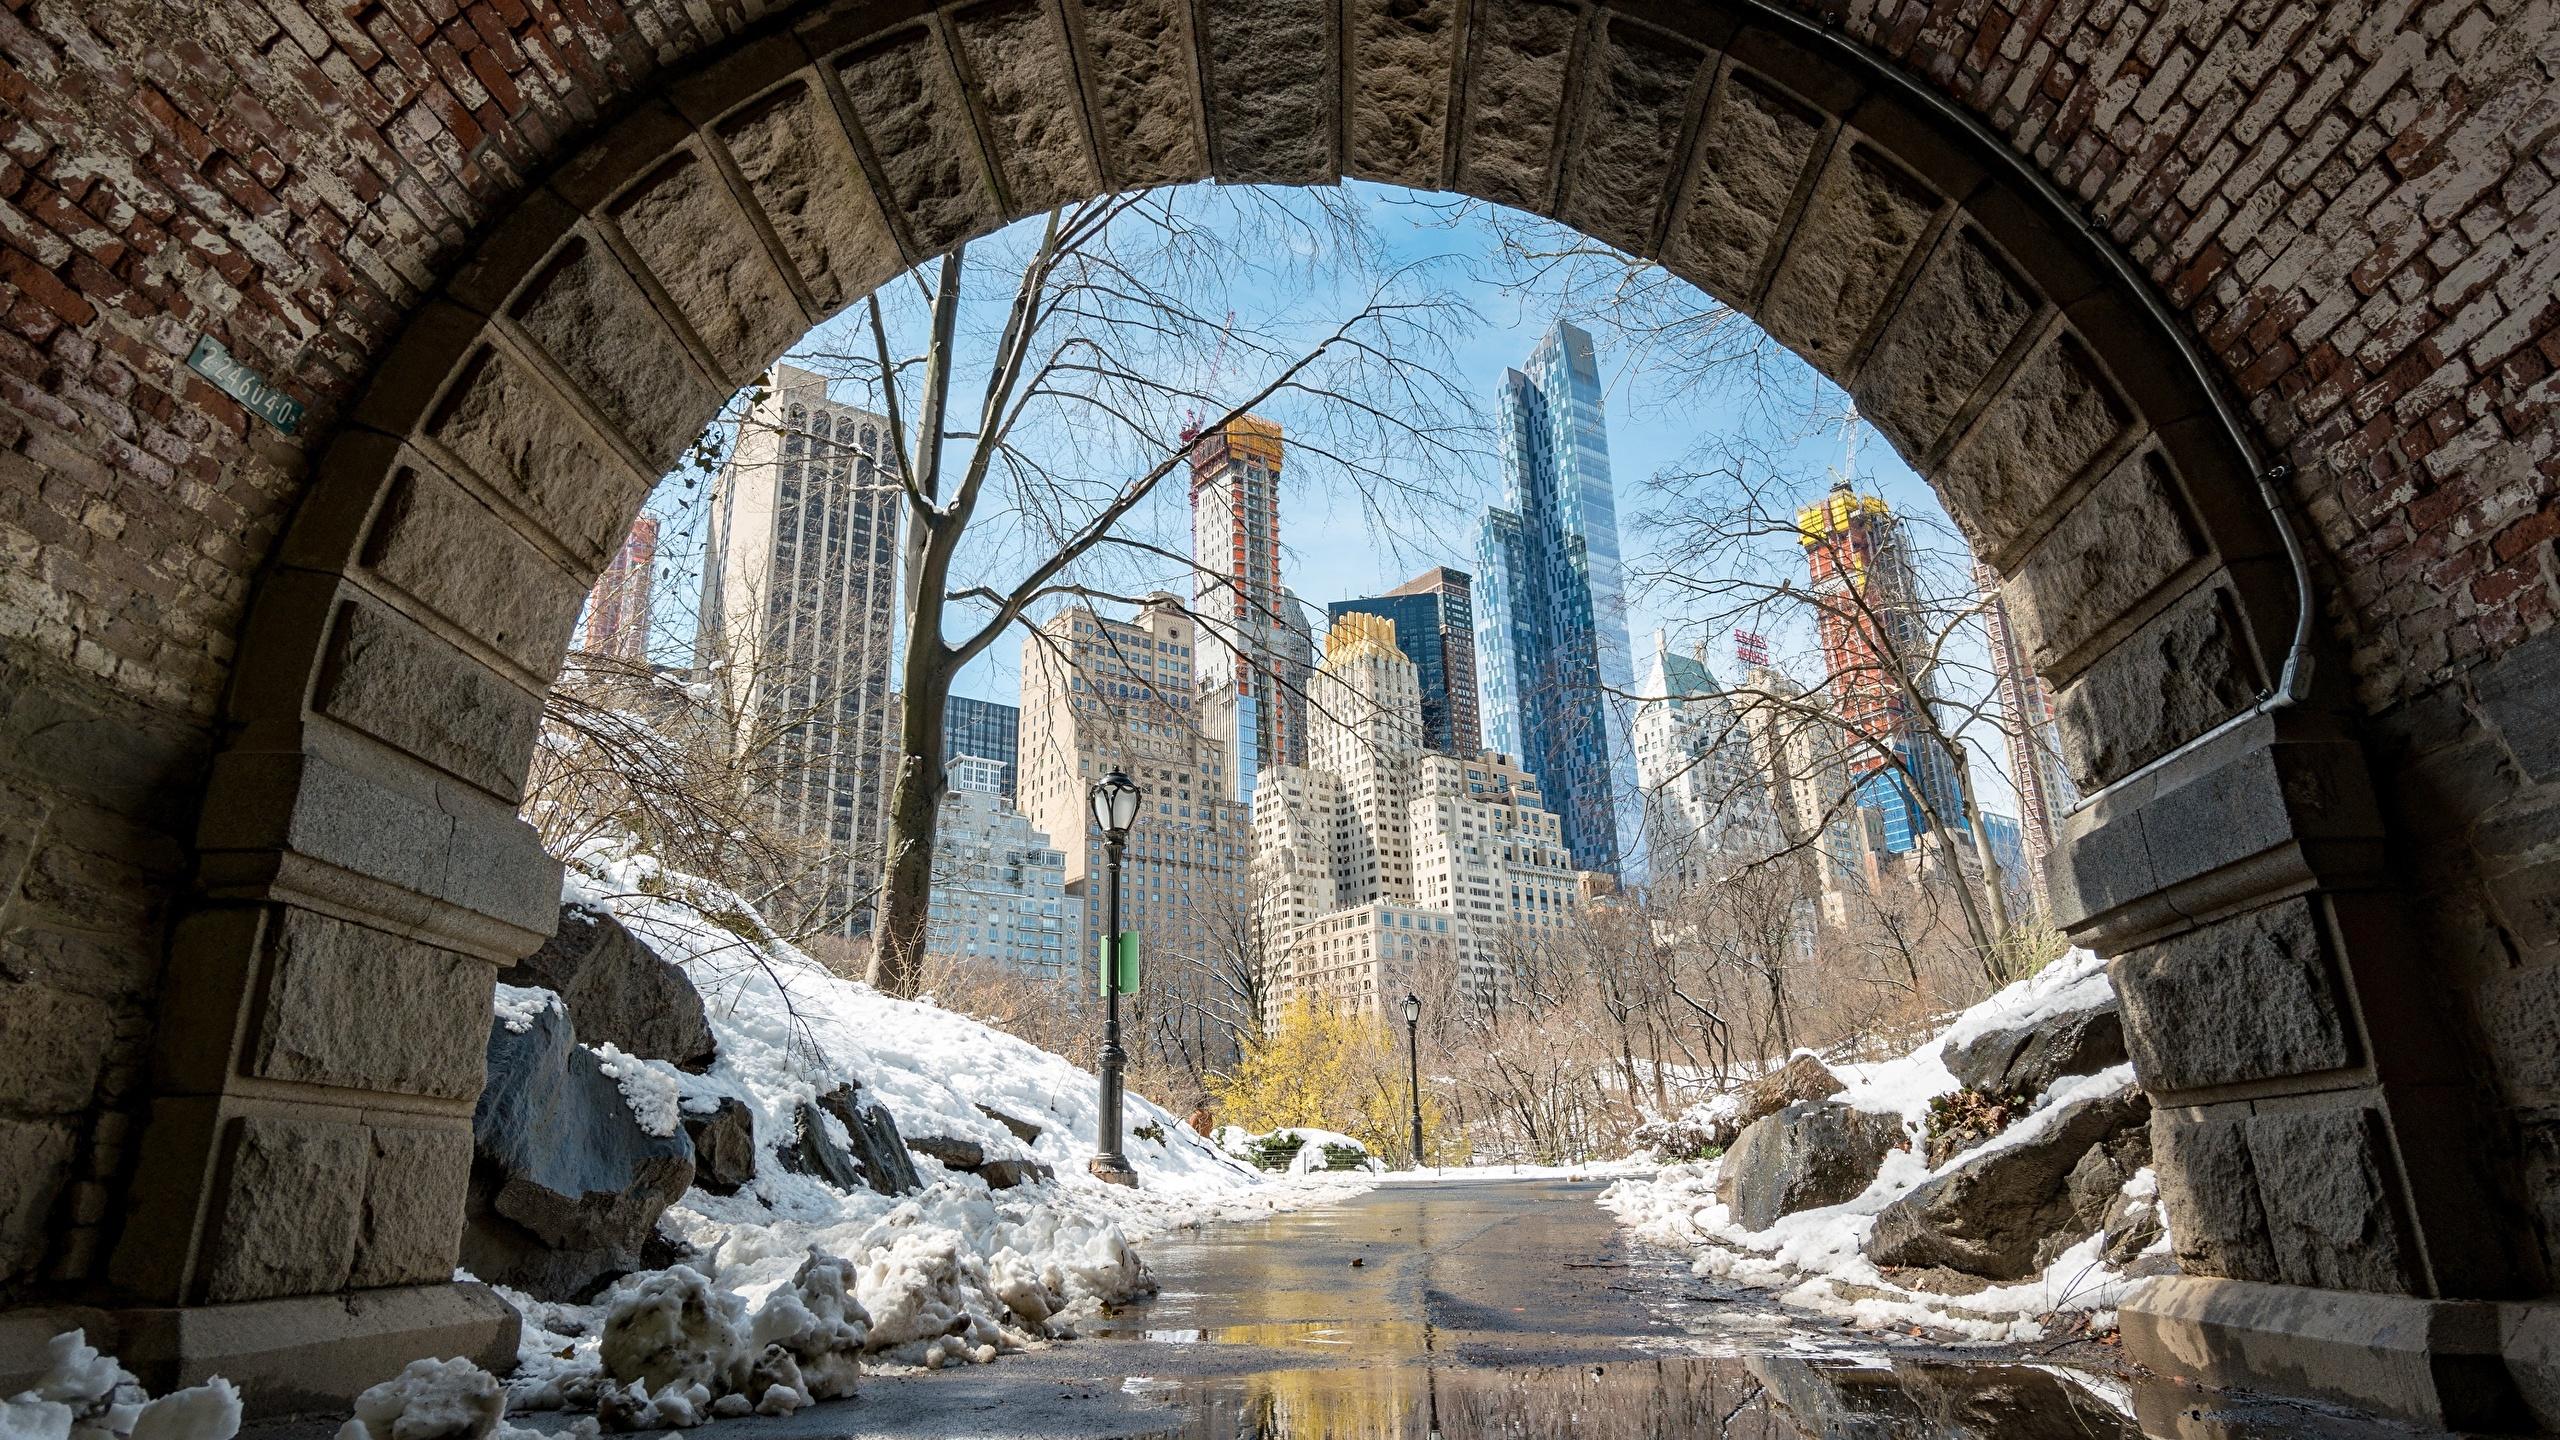 Fondos De Pantalla 2560x1440 Eeuu Manhattan Nieve Nueva